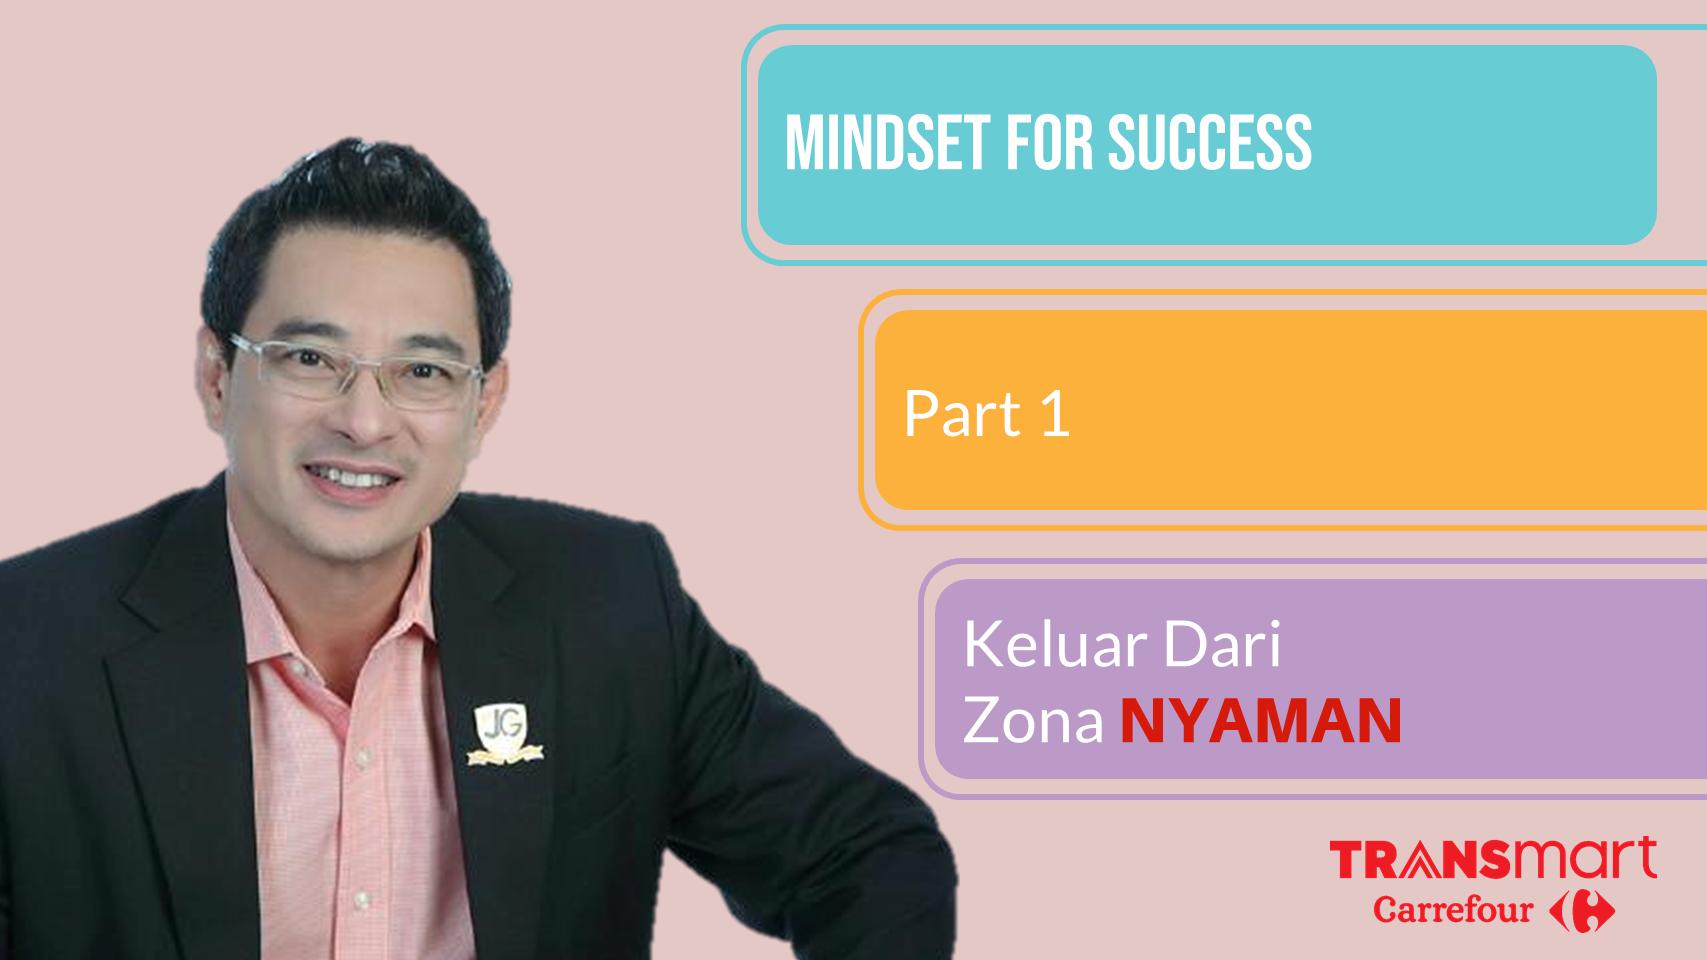 Mindset for Success Part 1